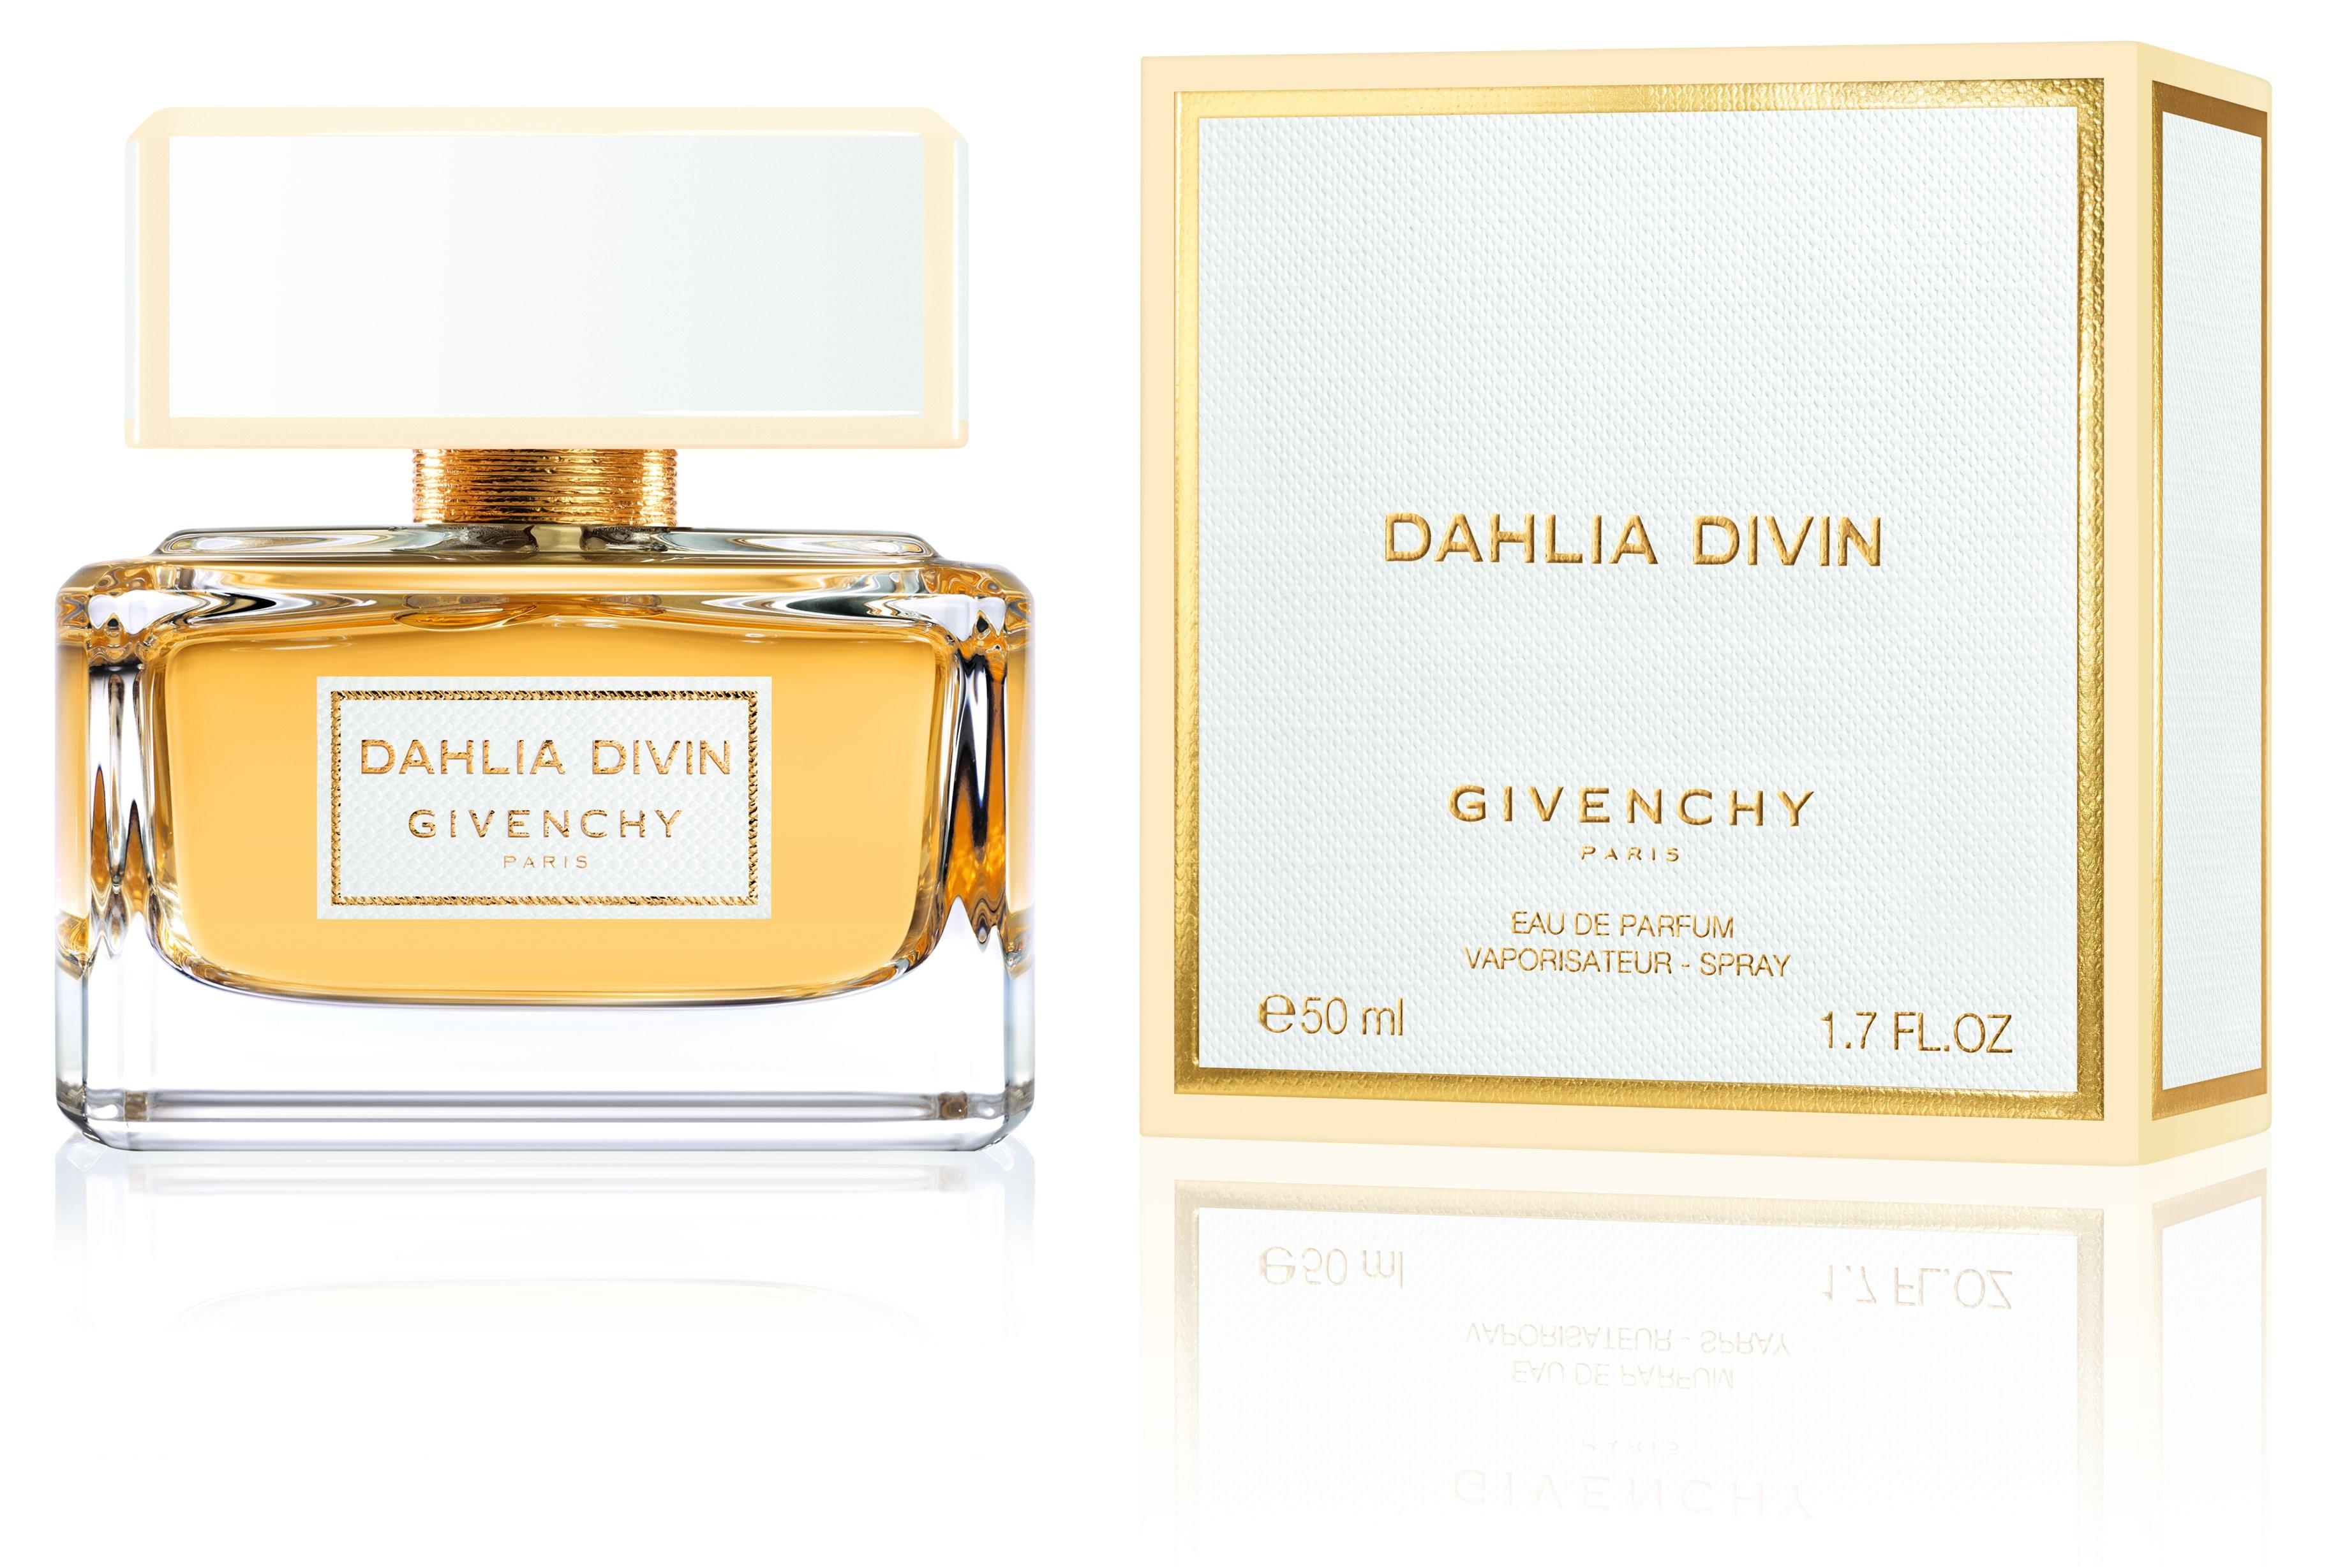 Givenchy Dahlia Divin аромат для женщин